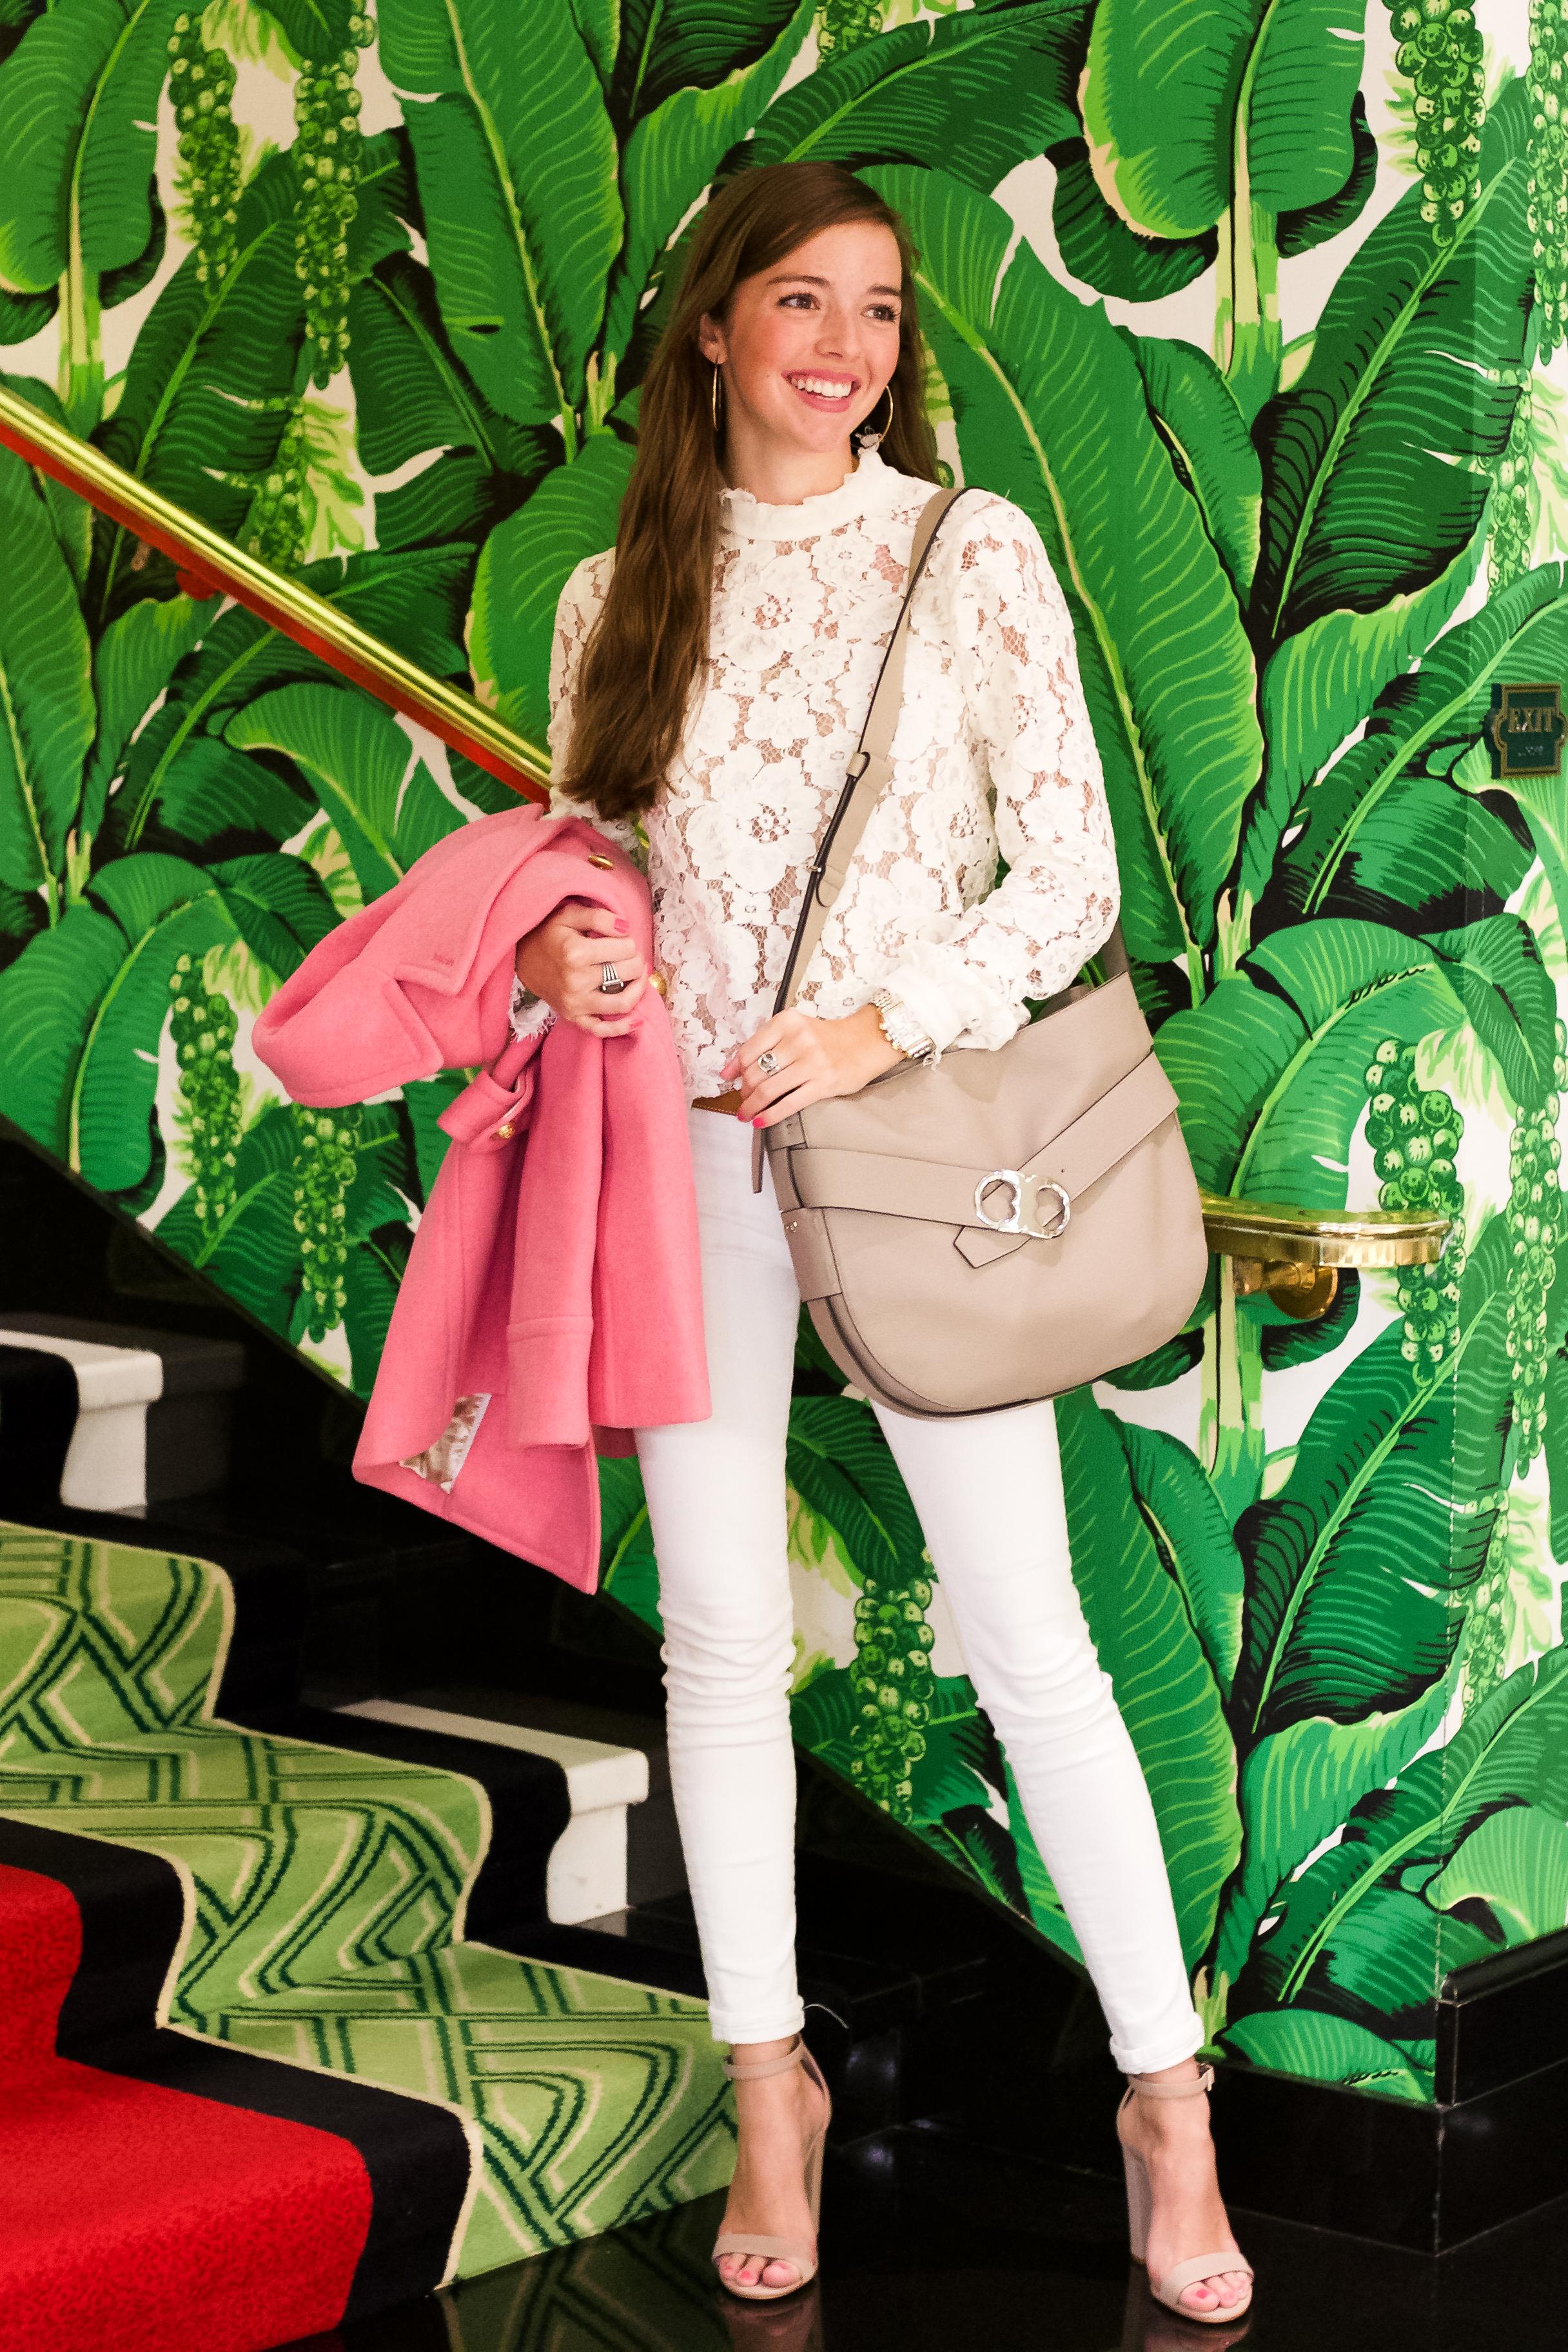 fashion blogger lcb style greenbrier tory burch j. crew (1 of 14).jpg